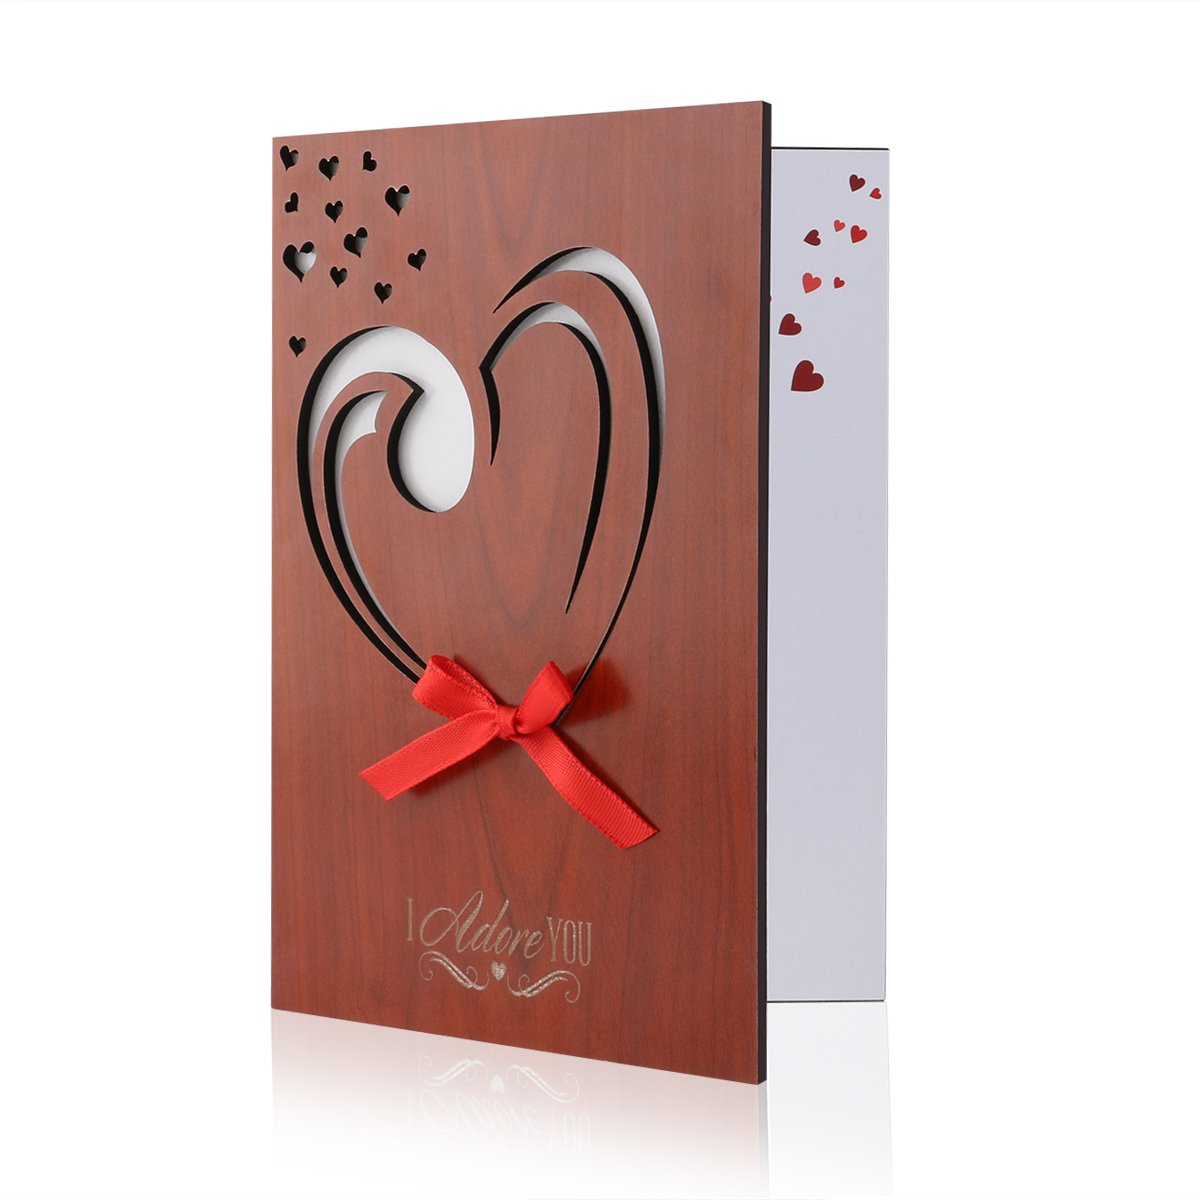 Valentines greeting card handmade love cards best gift for her valentines greeting card handmade love cards best gift for her womens present m4hsunfo